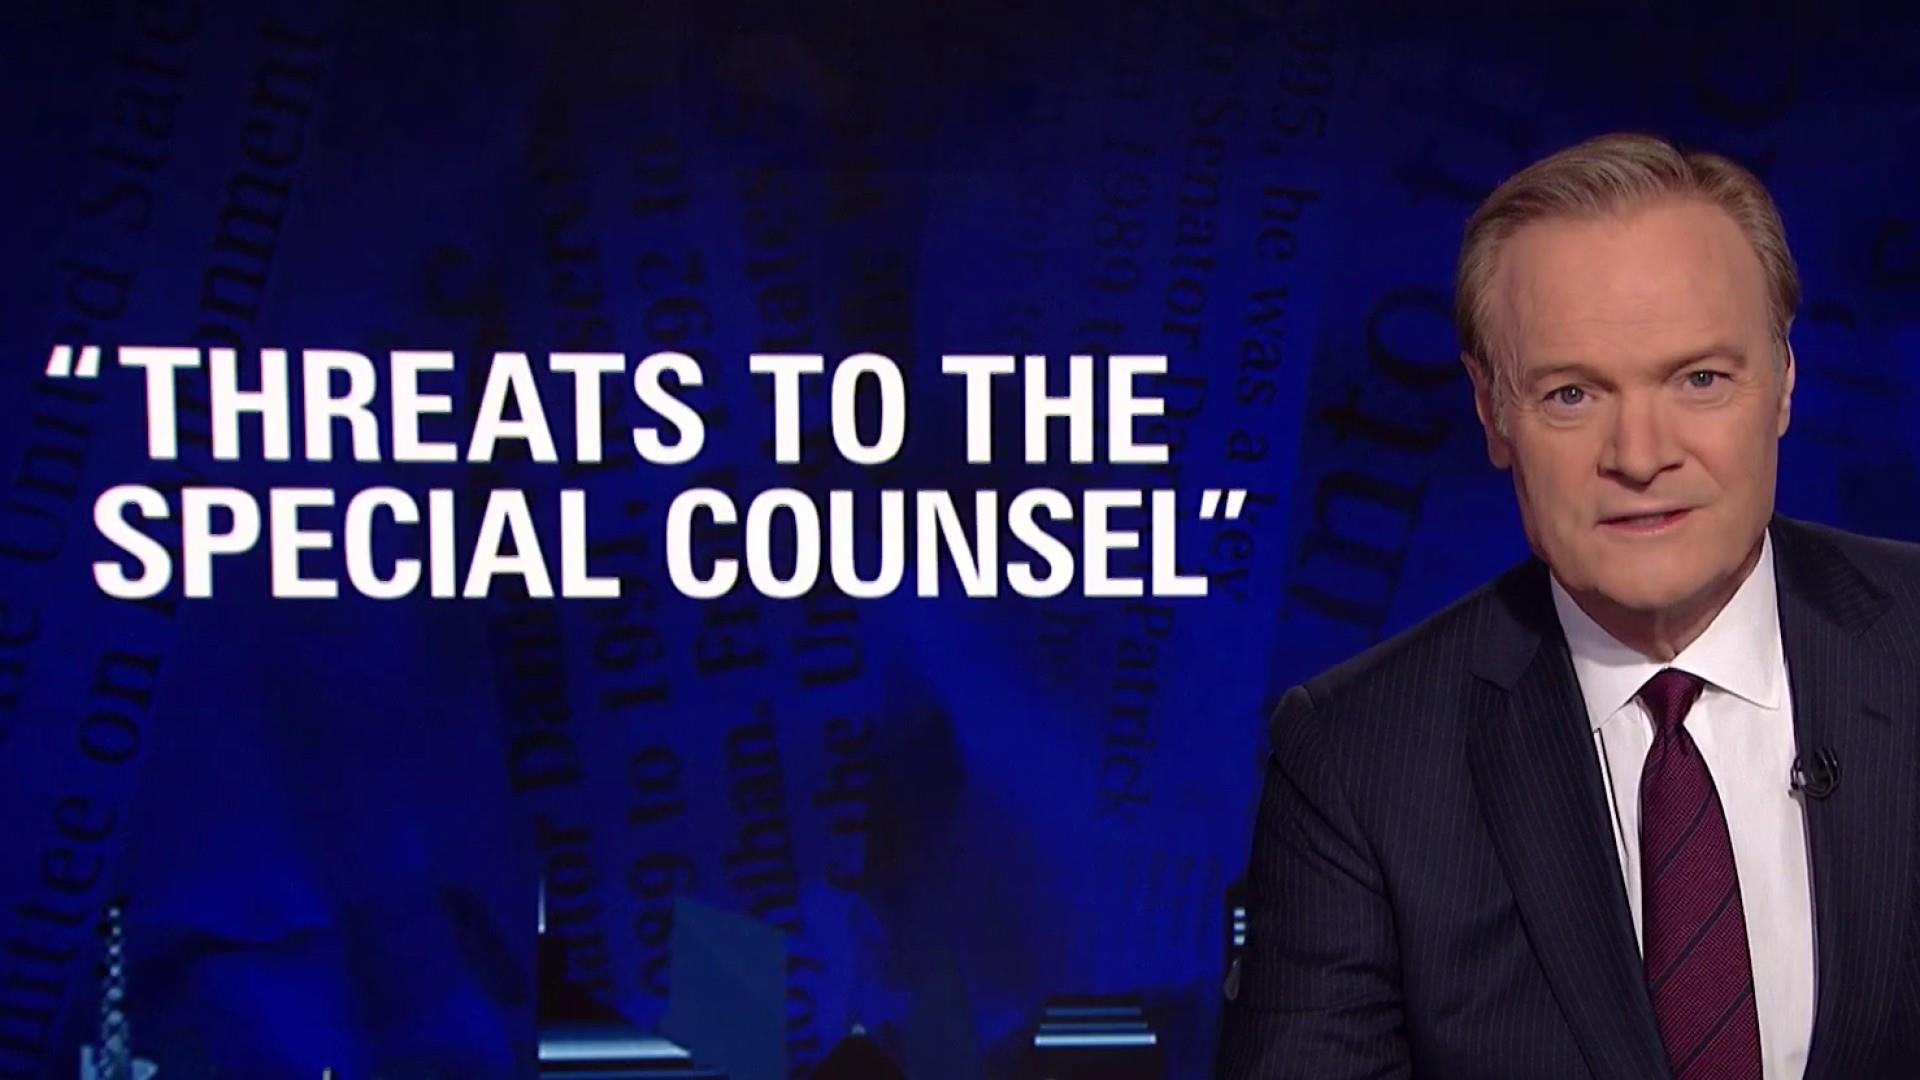 Will Trump fire Mueller in a 'Christmas Massacre'?